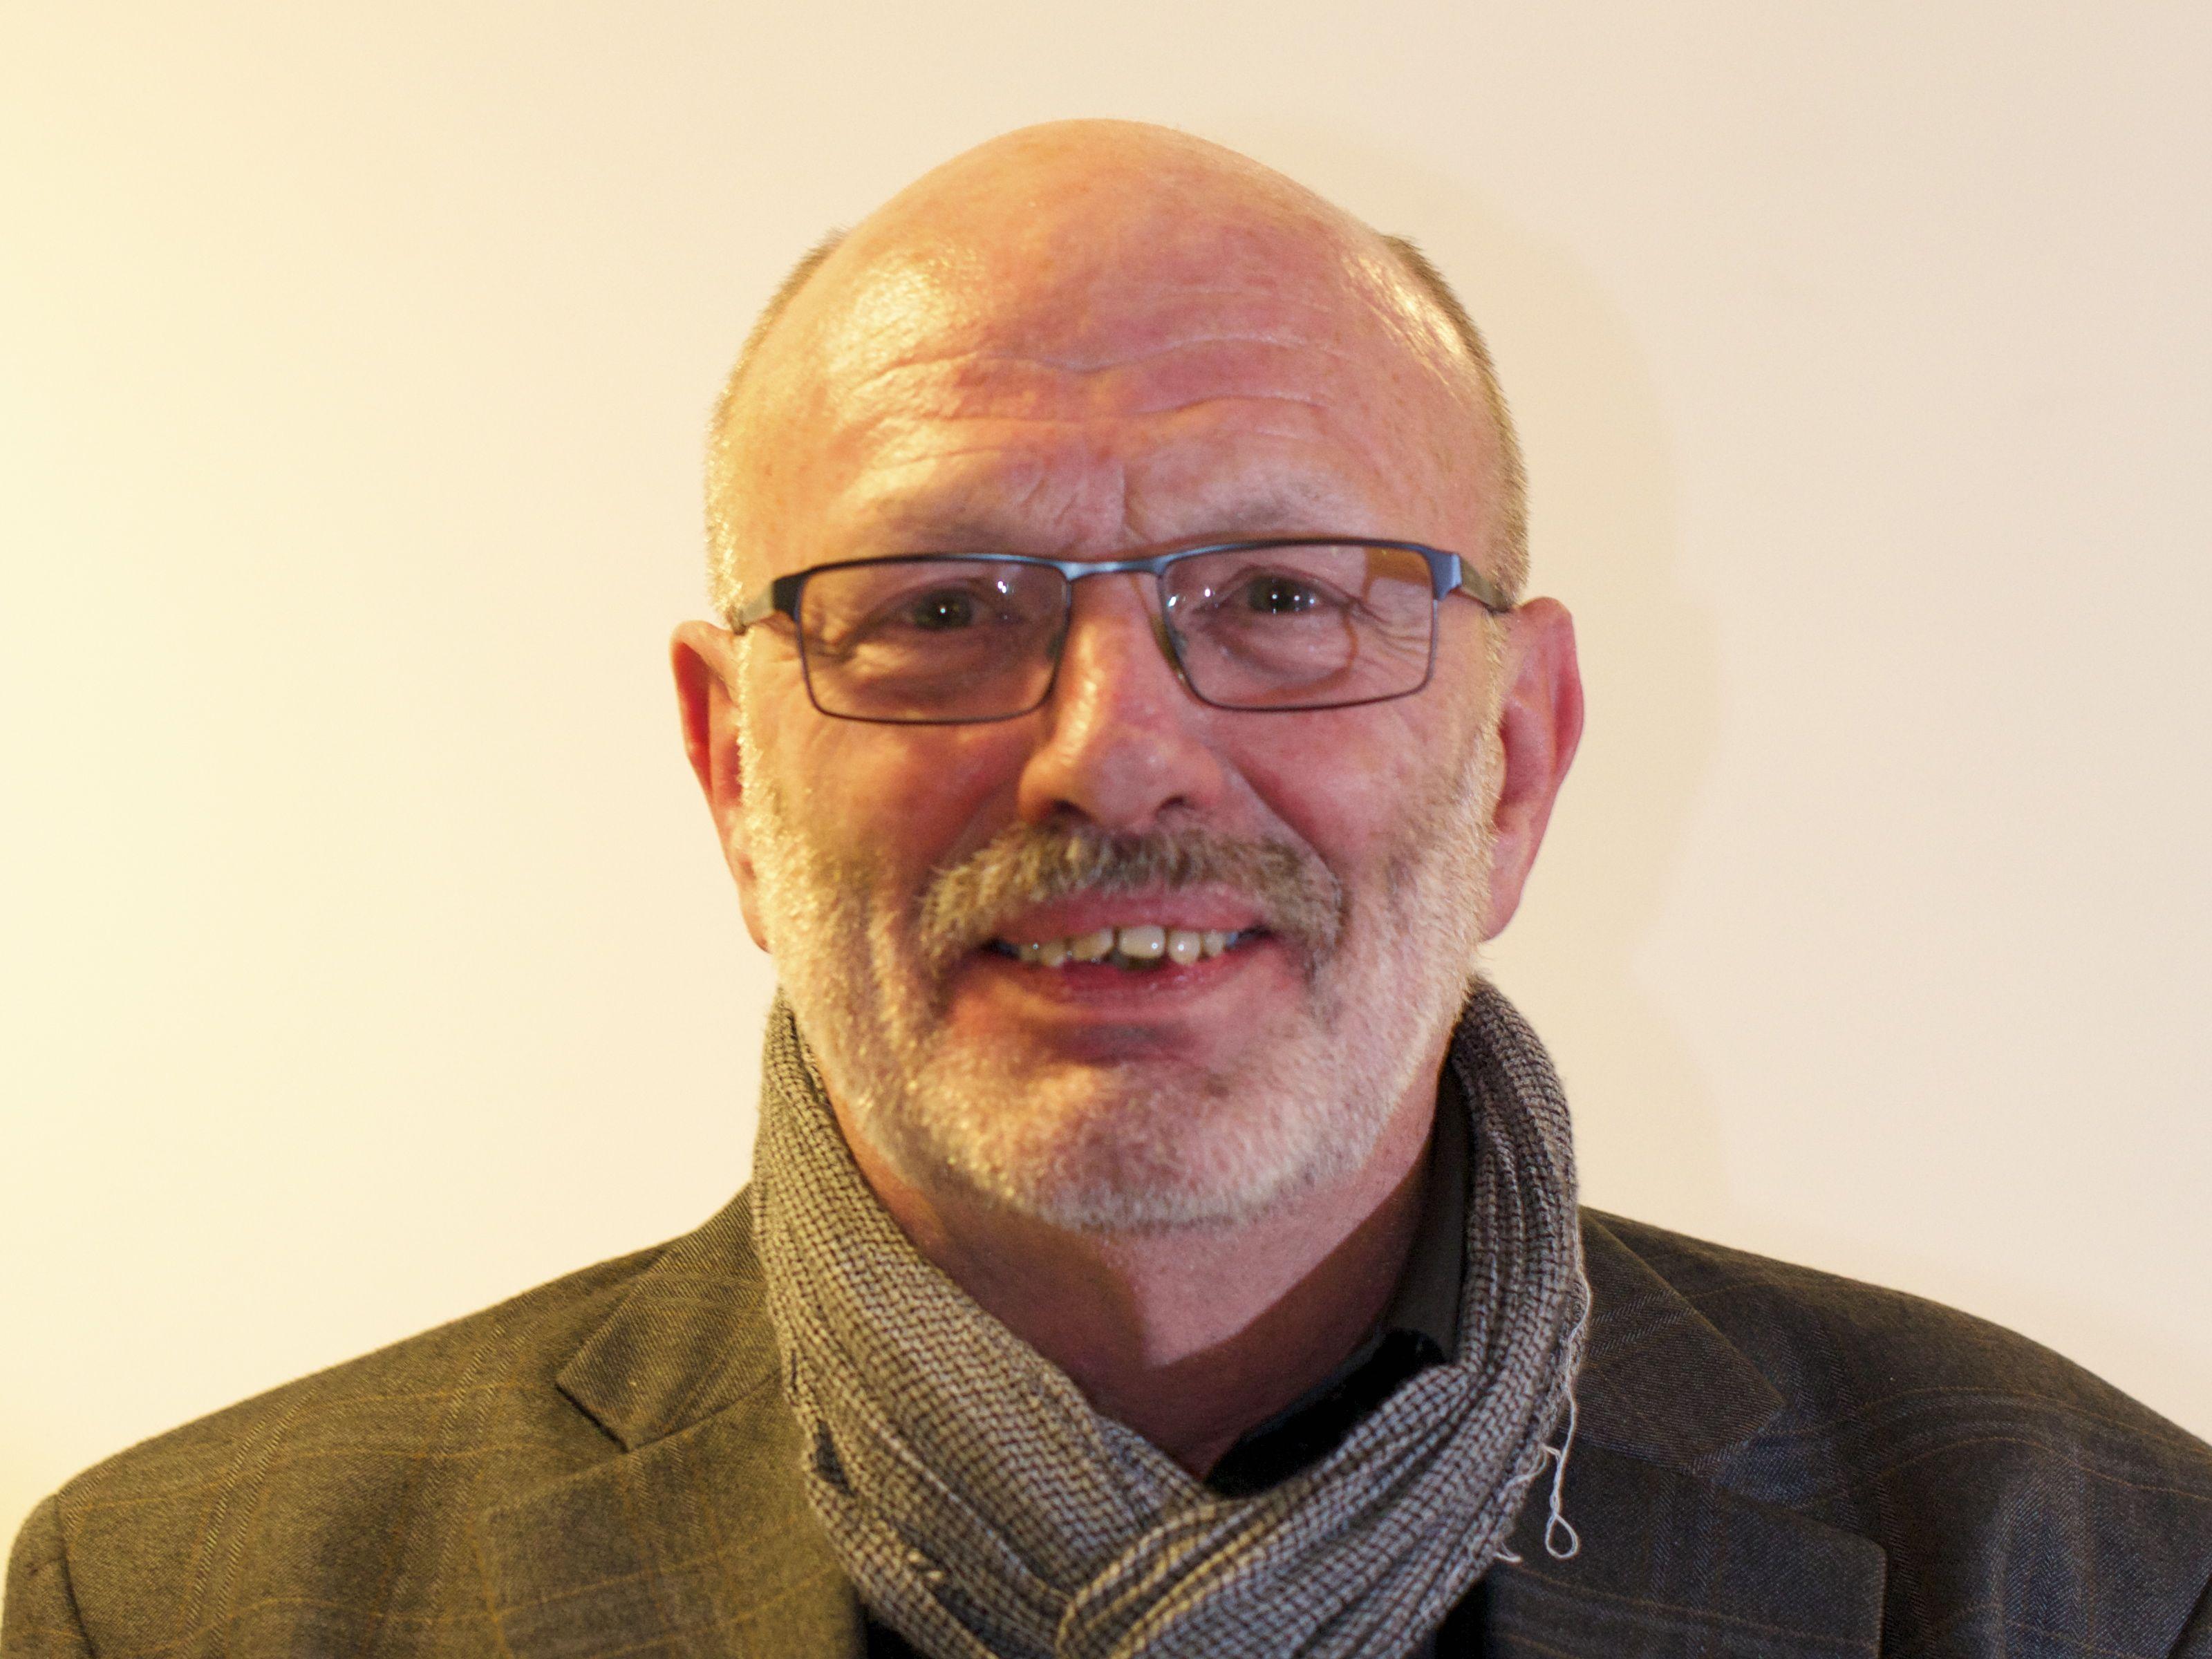 Reinhard Bodack